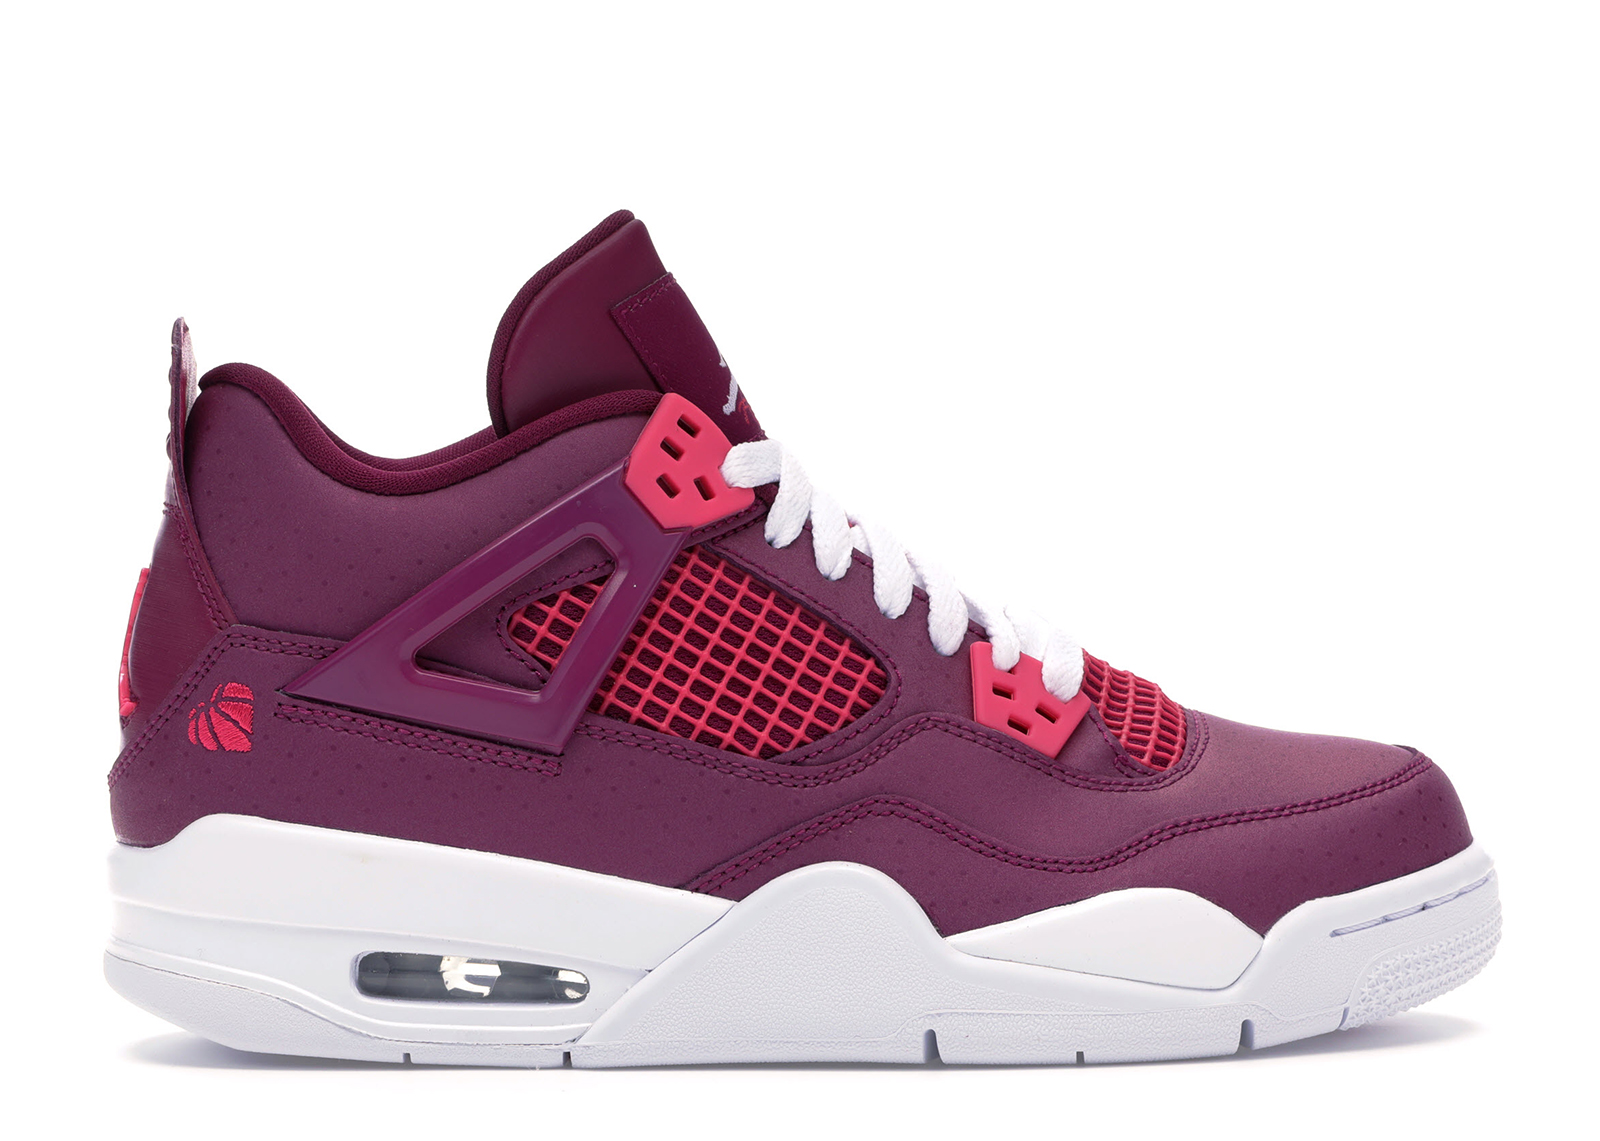 Jordan 4 Retro Valentine's Day 2019 (GS